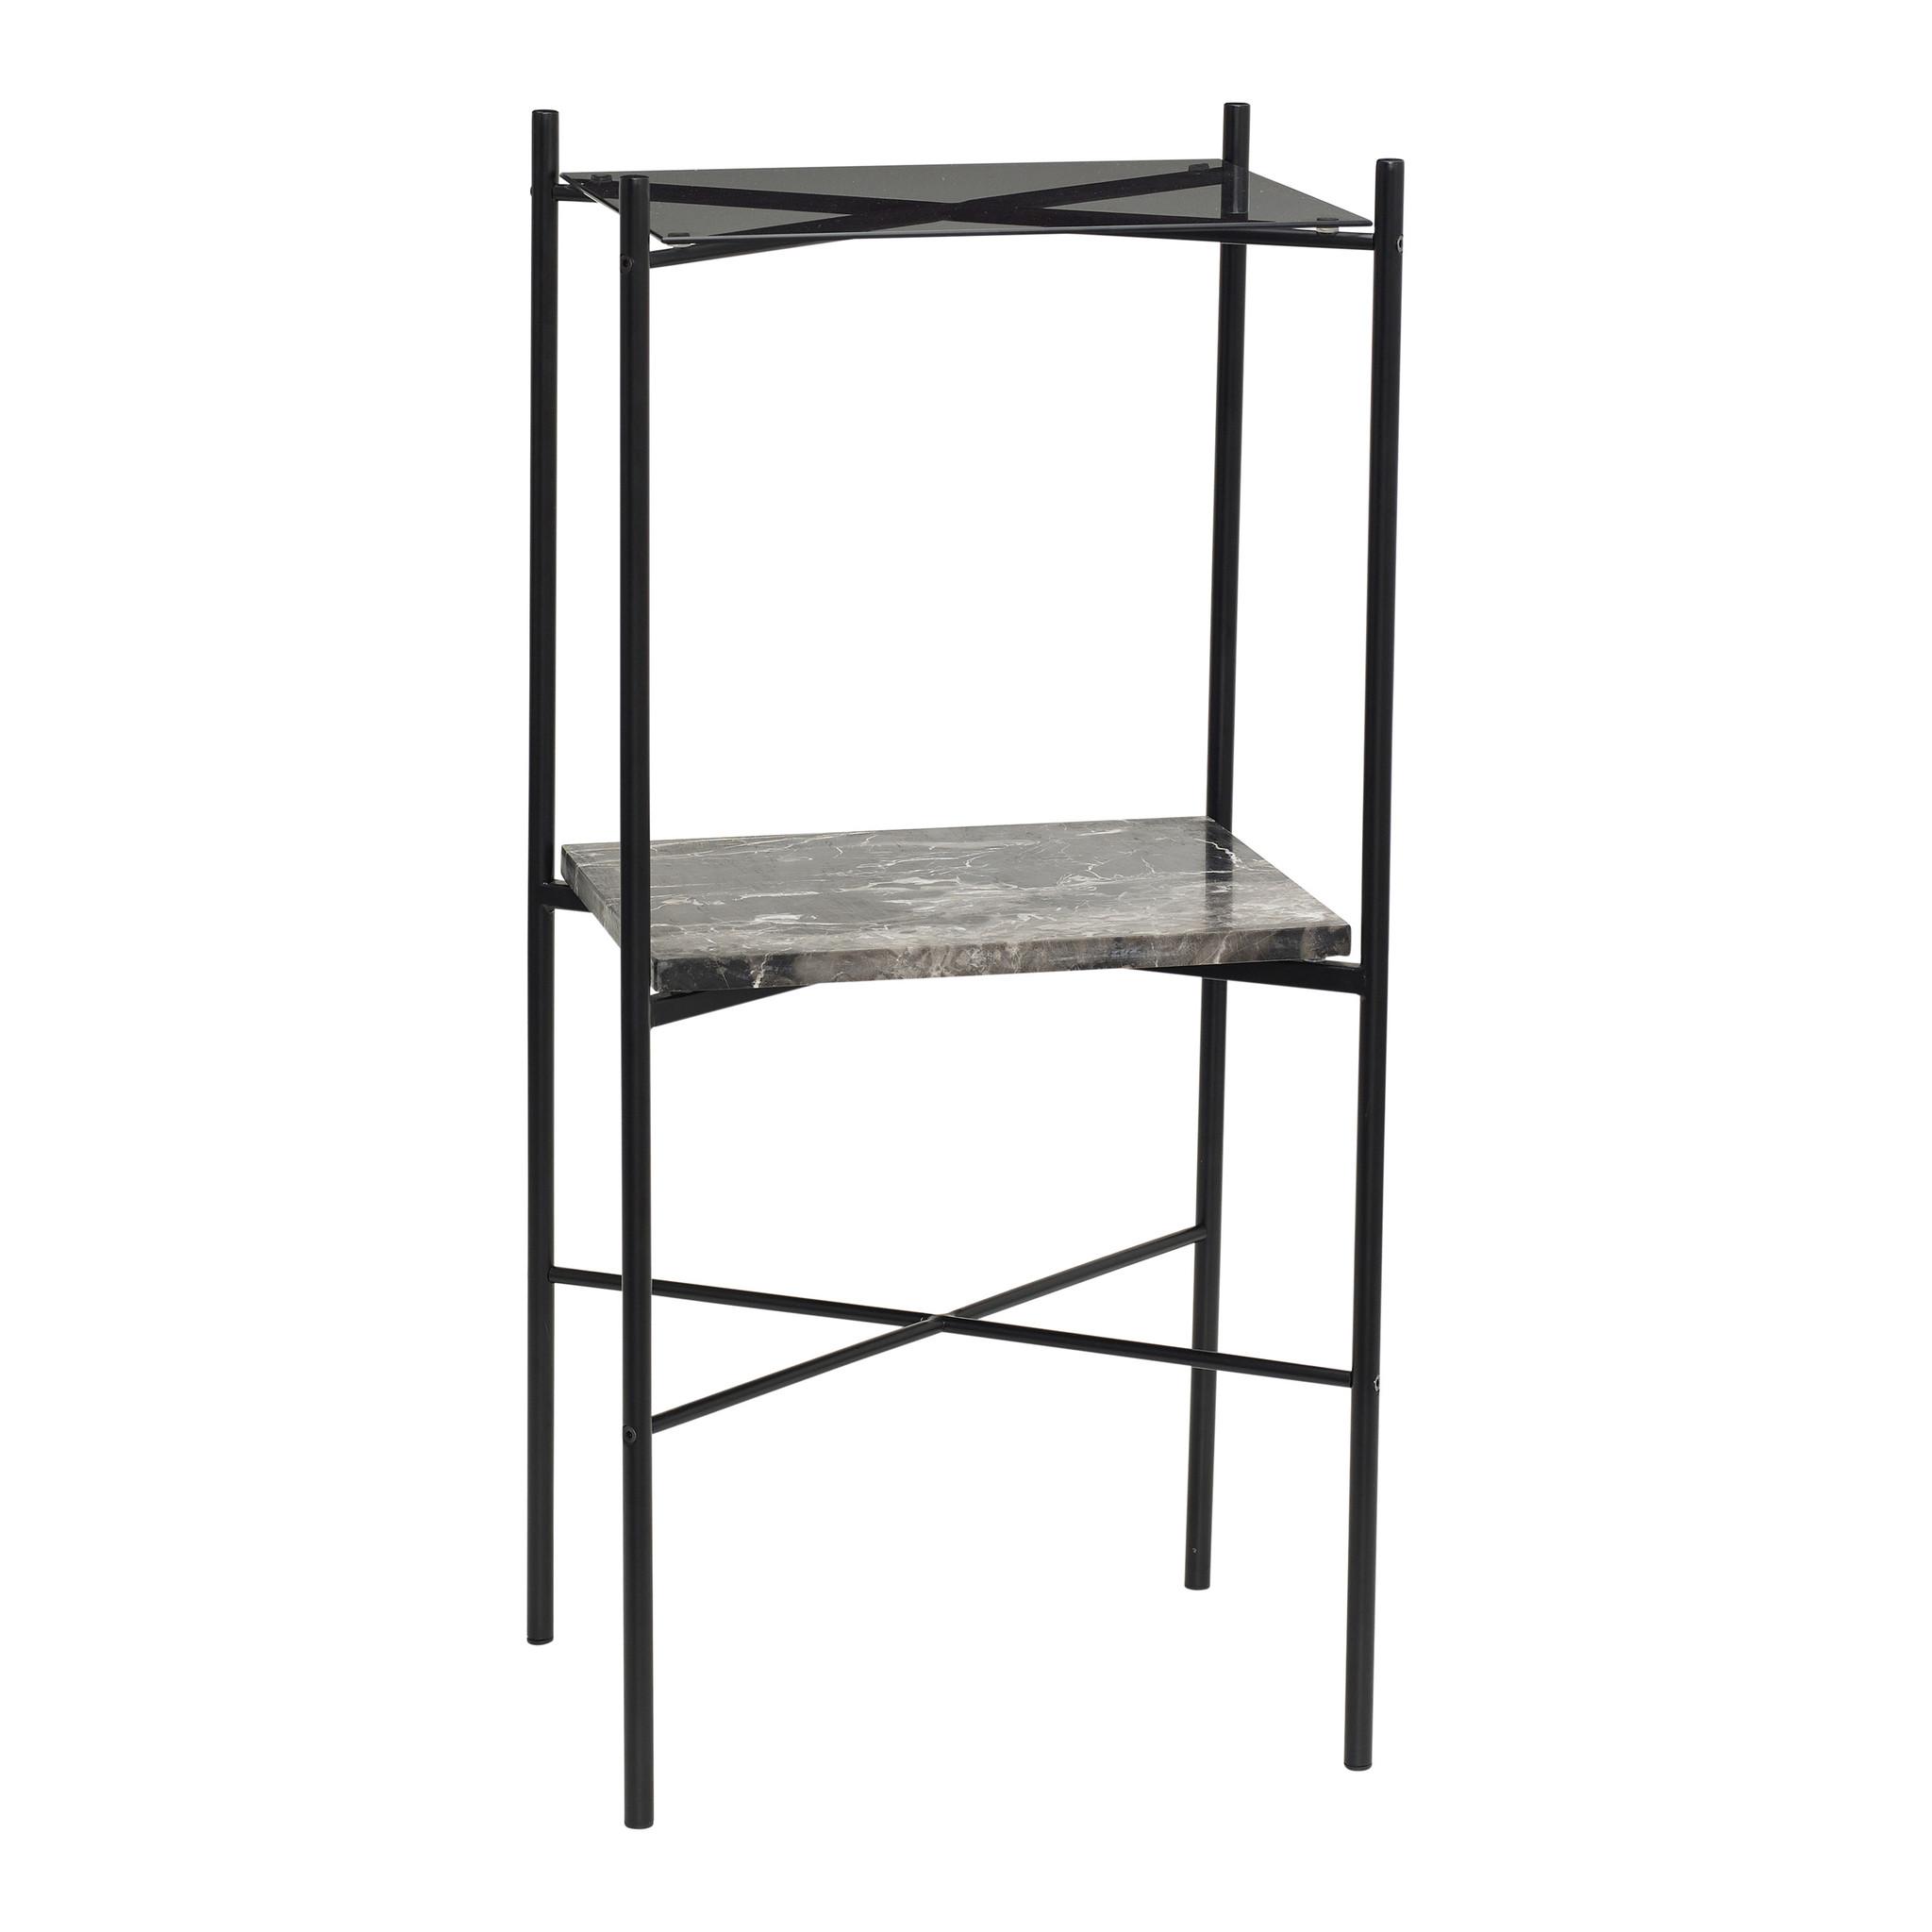 Hubsch Tafel, metaal / marmer / glas, zwart-20806-5712772070116